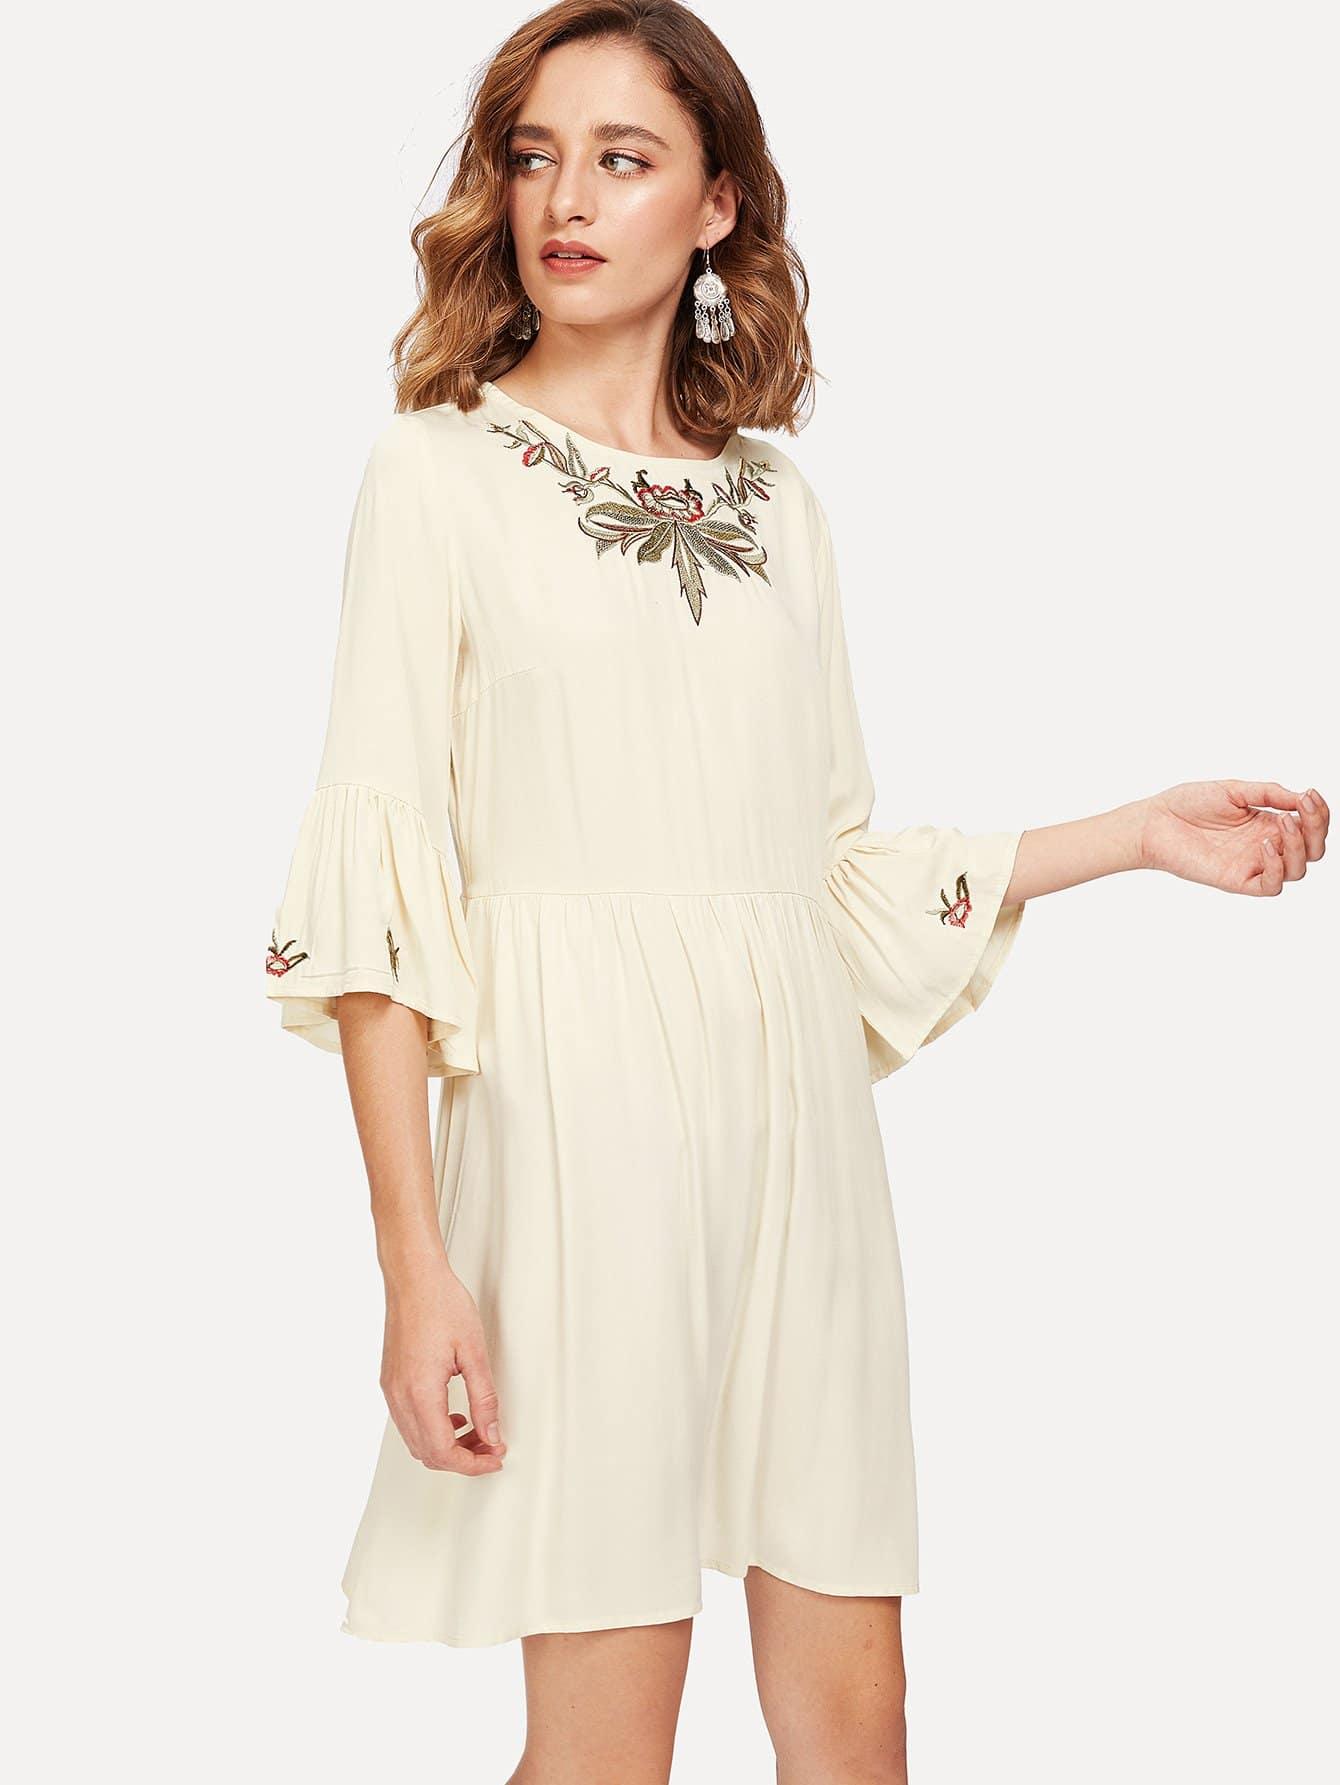 Flounce Sleeve Embroidery Smock Dress corduroy babydoll smock dress